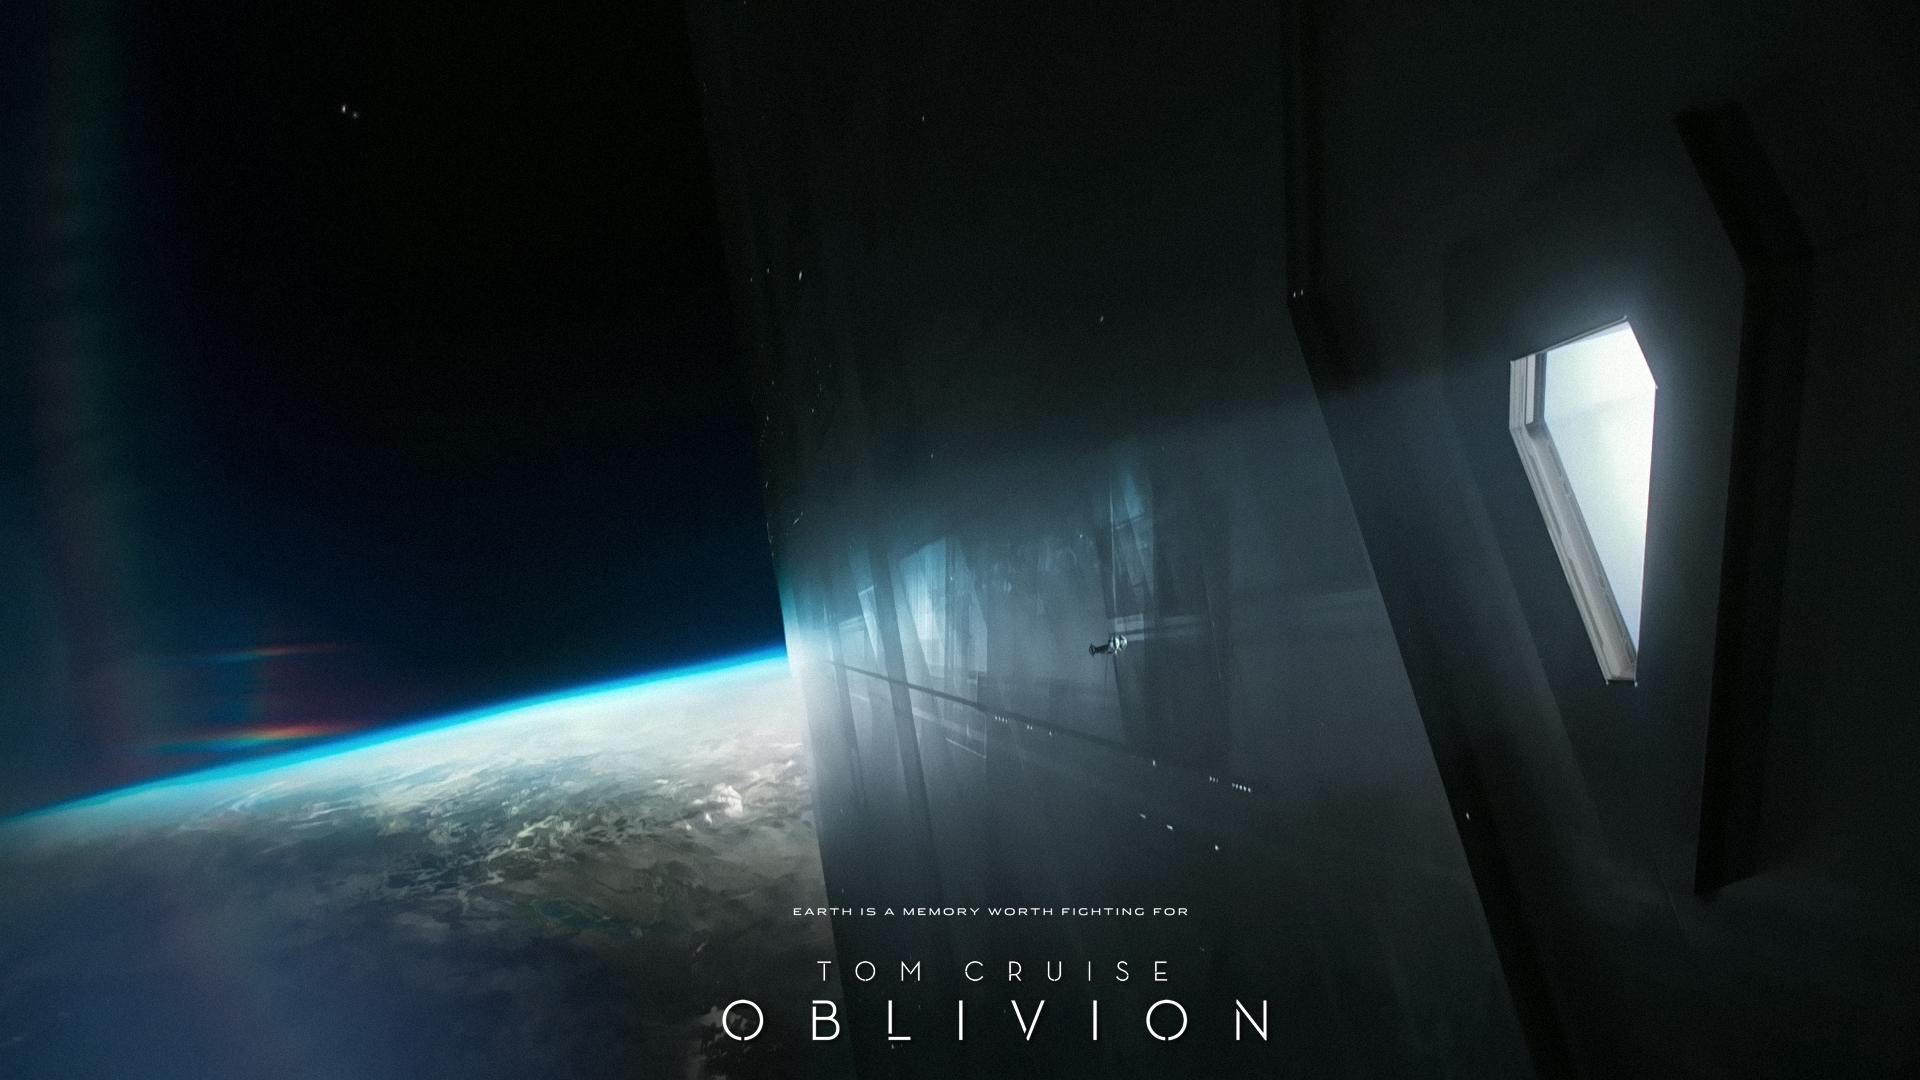 Oblivion wallpaper 10 | WallpapersBQ